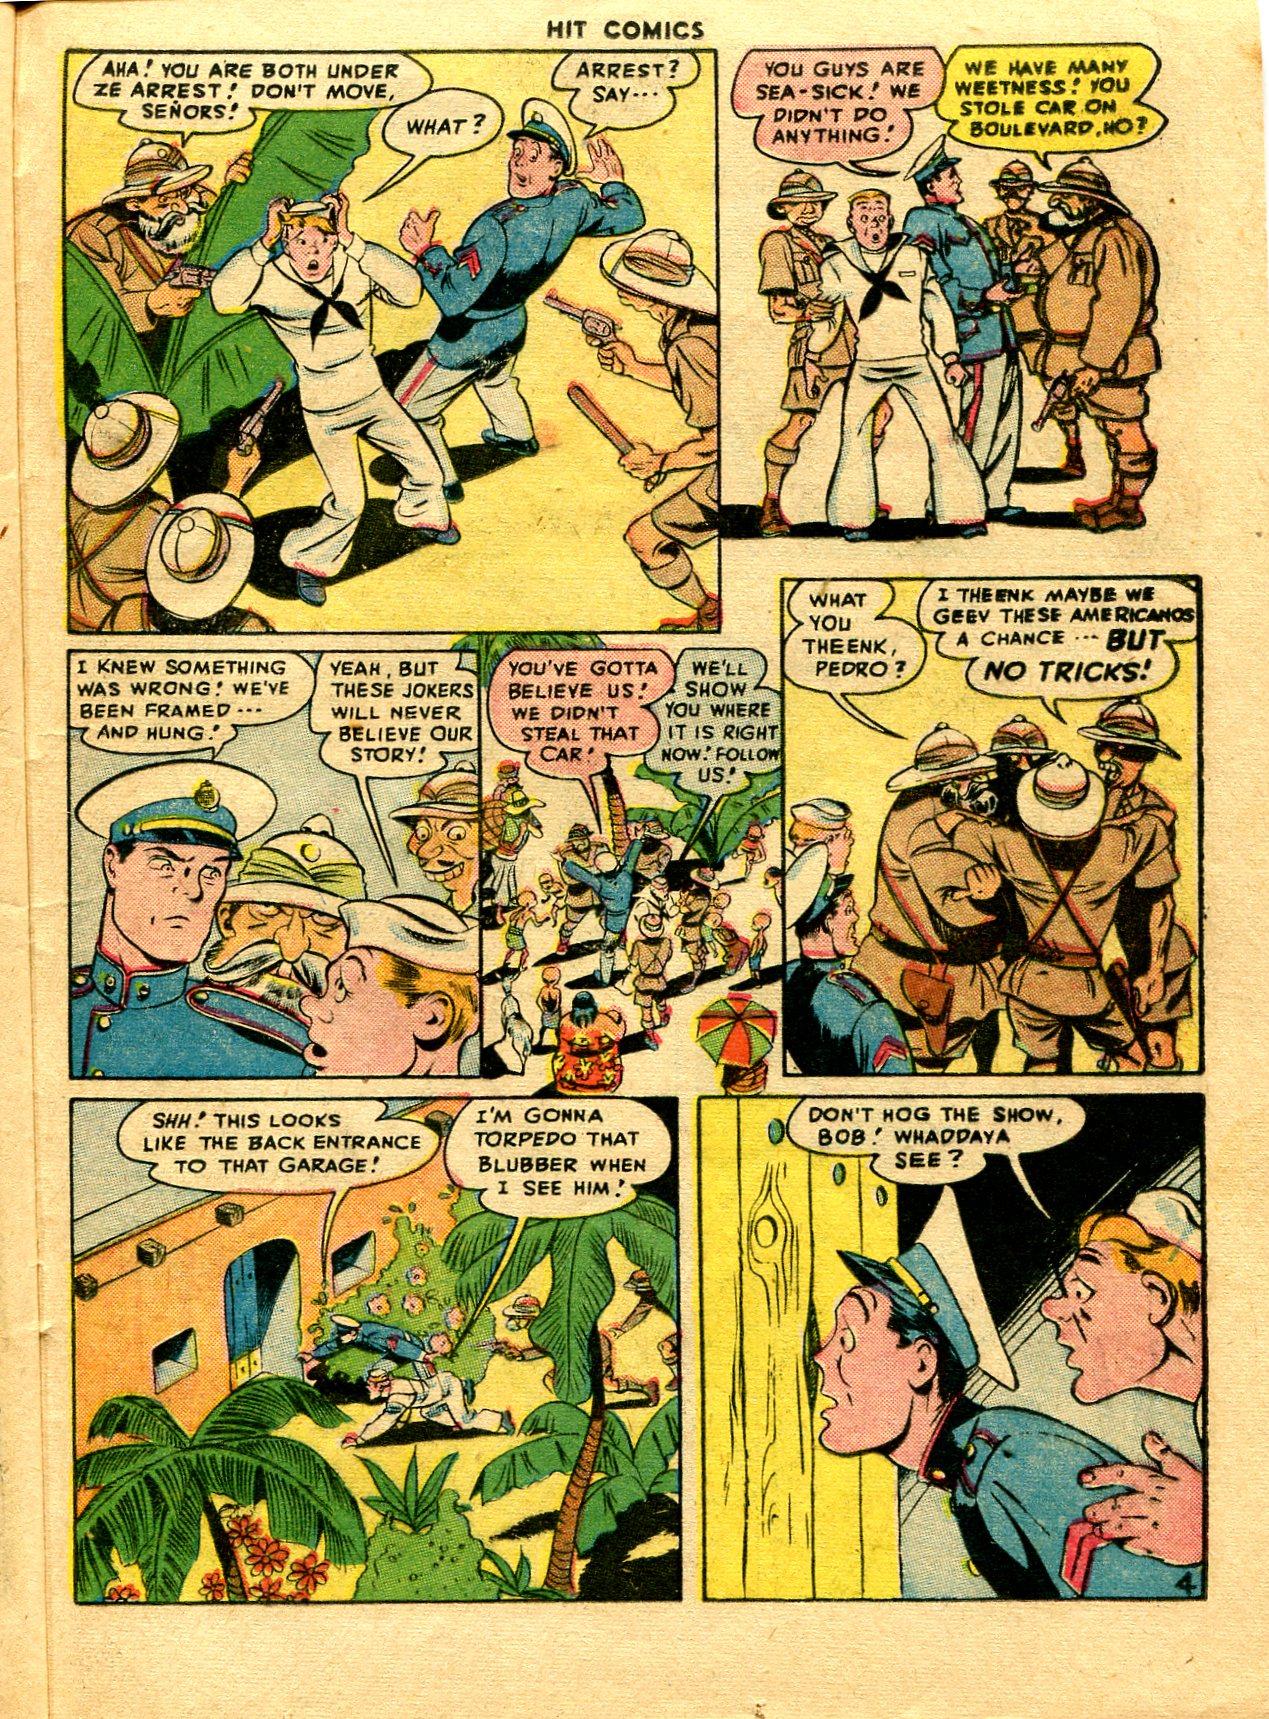 Read online Hit Comics comic -  Issue #48 - 35